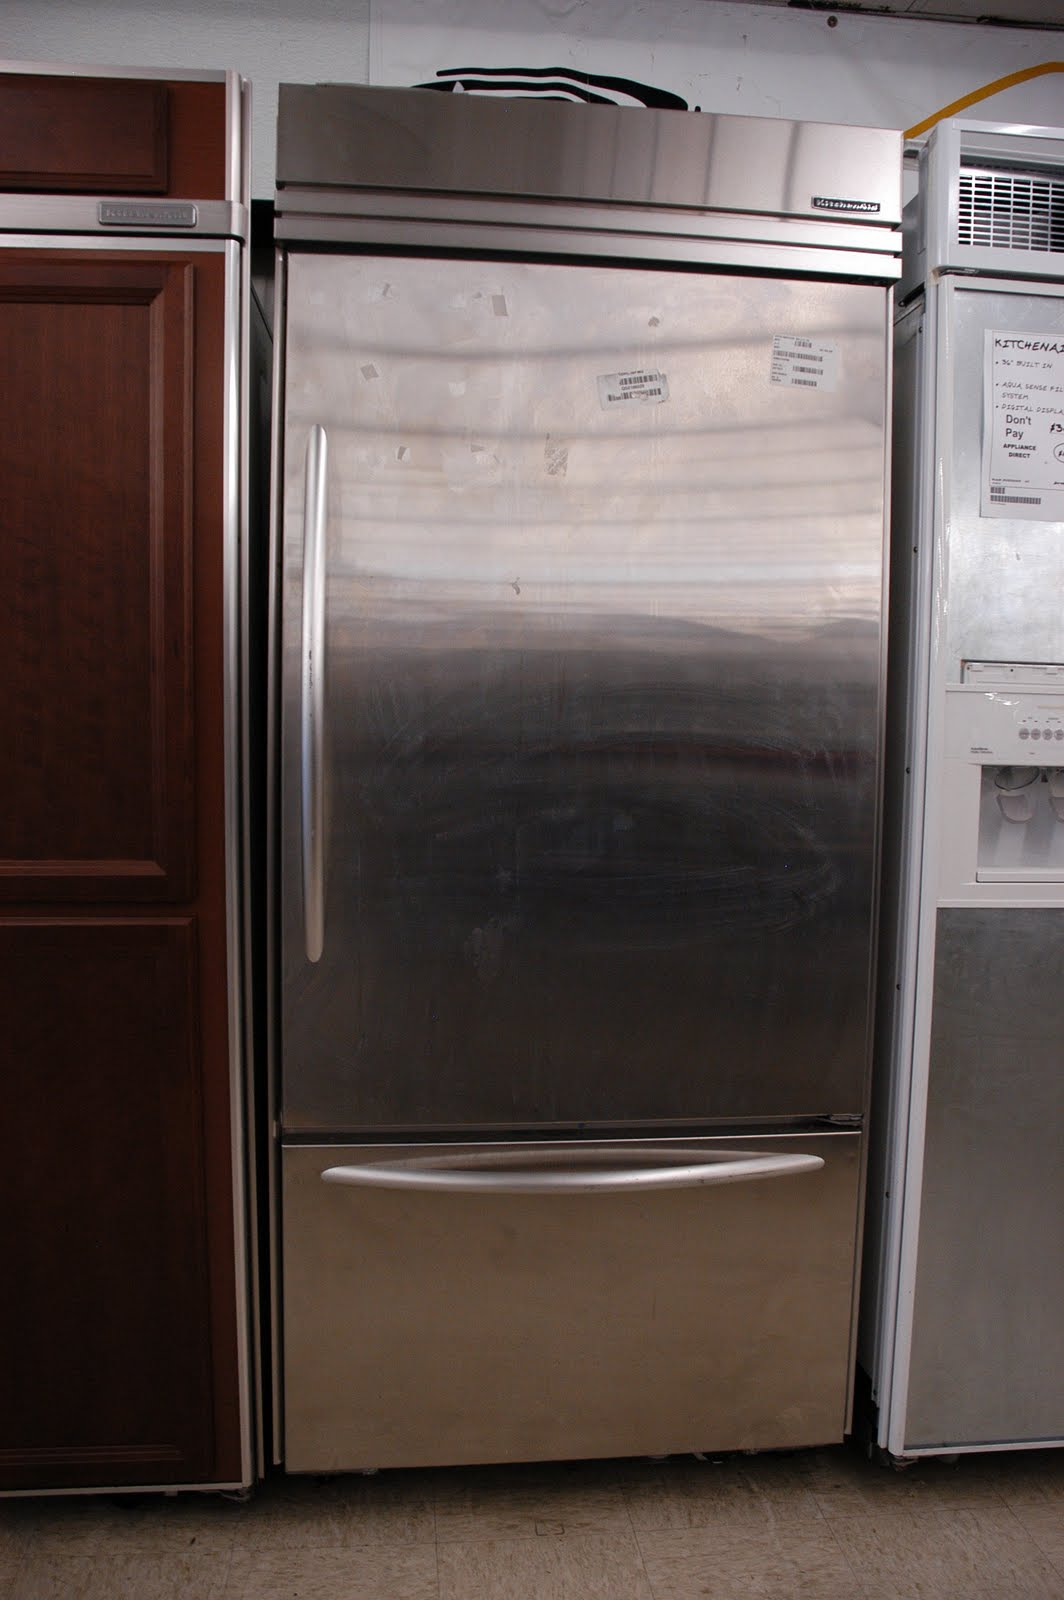 Appliance Direct Video Blog Kitchenaid 20 4 Cu Ft Stainless Steel Bottom Freezer Refrigerator